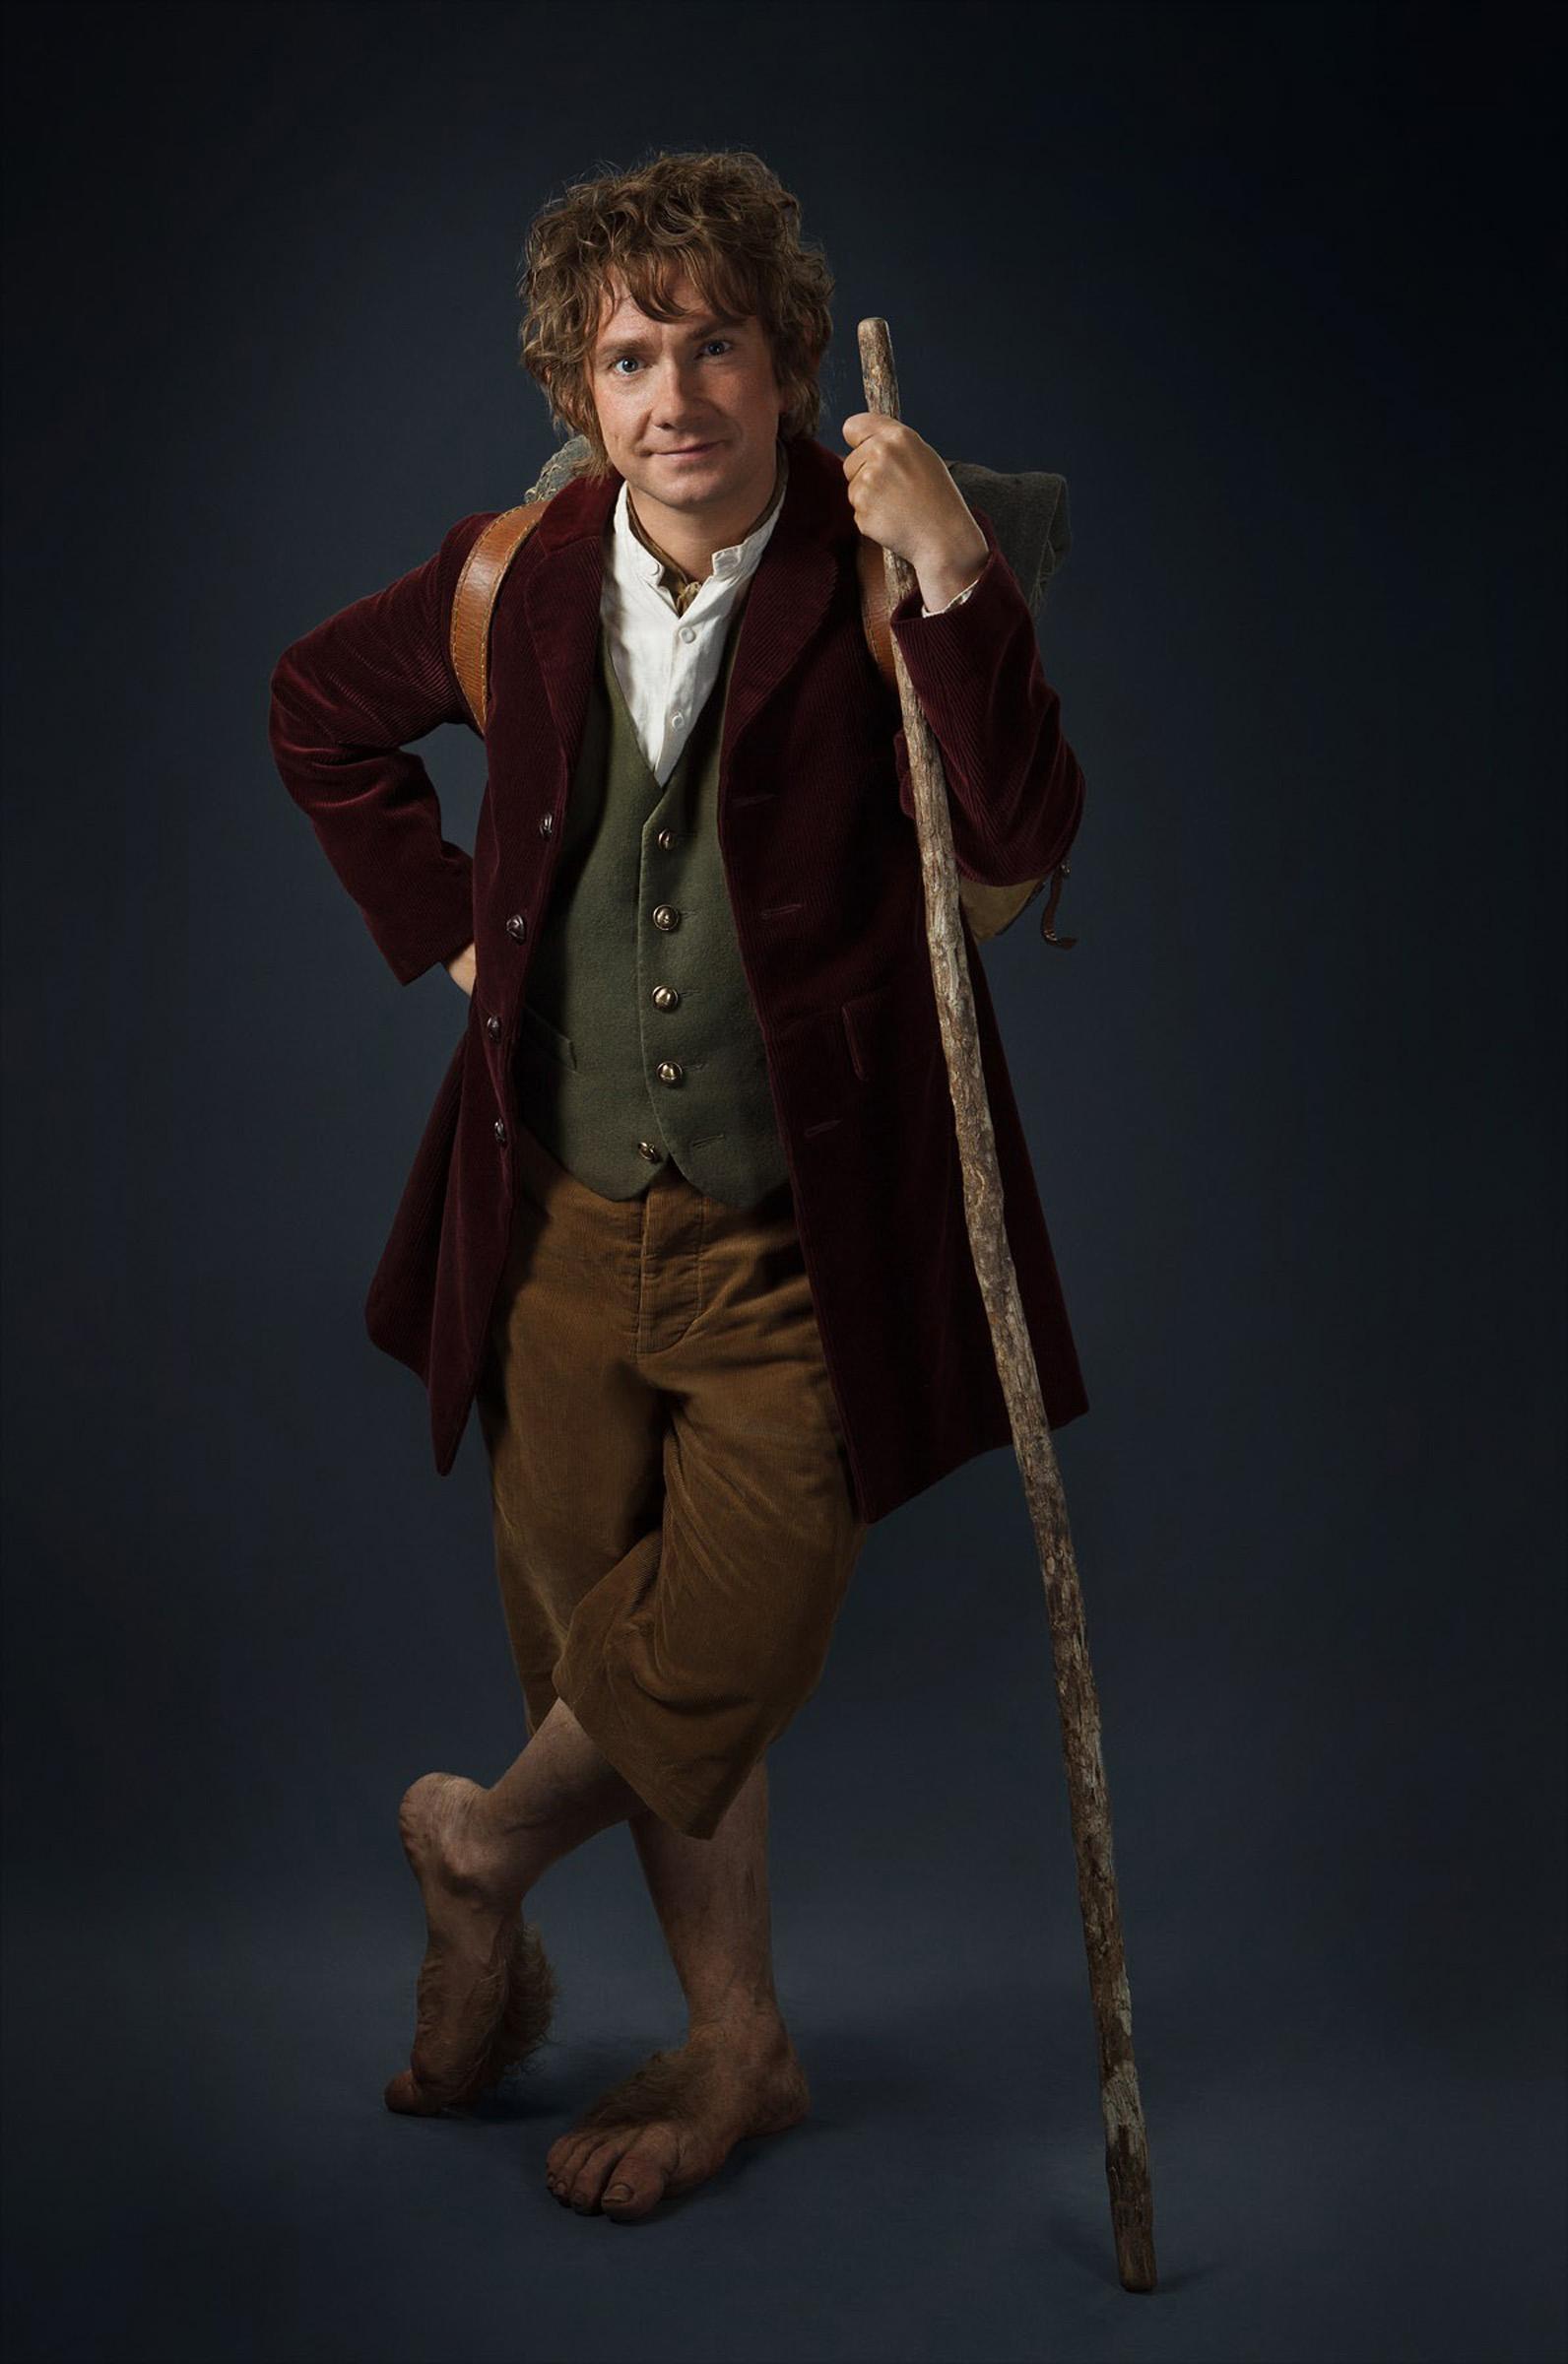 bilbo baggins characteristics Bilbo baggins the hobbit (1937 book) the hobbit (creative franchise)  personality traits and characteristics character and personality.